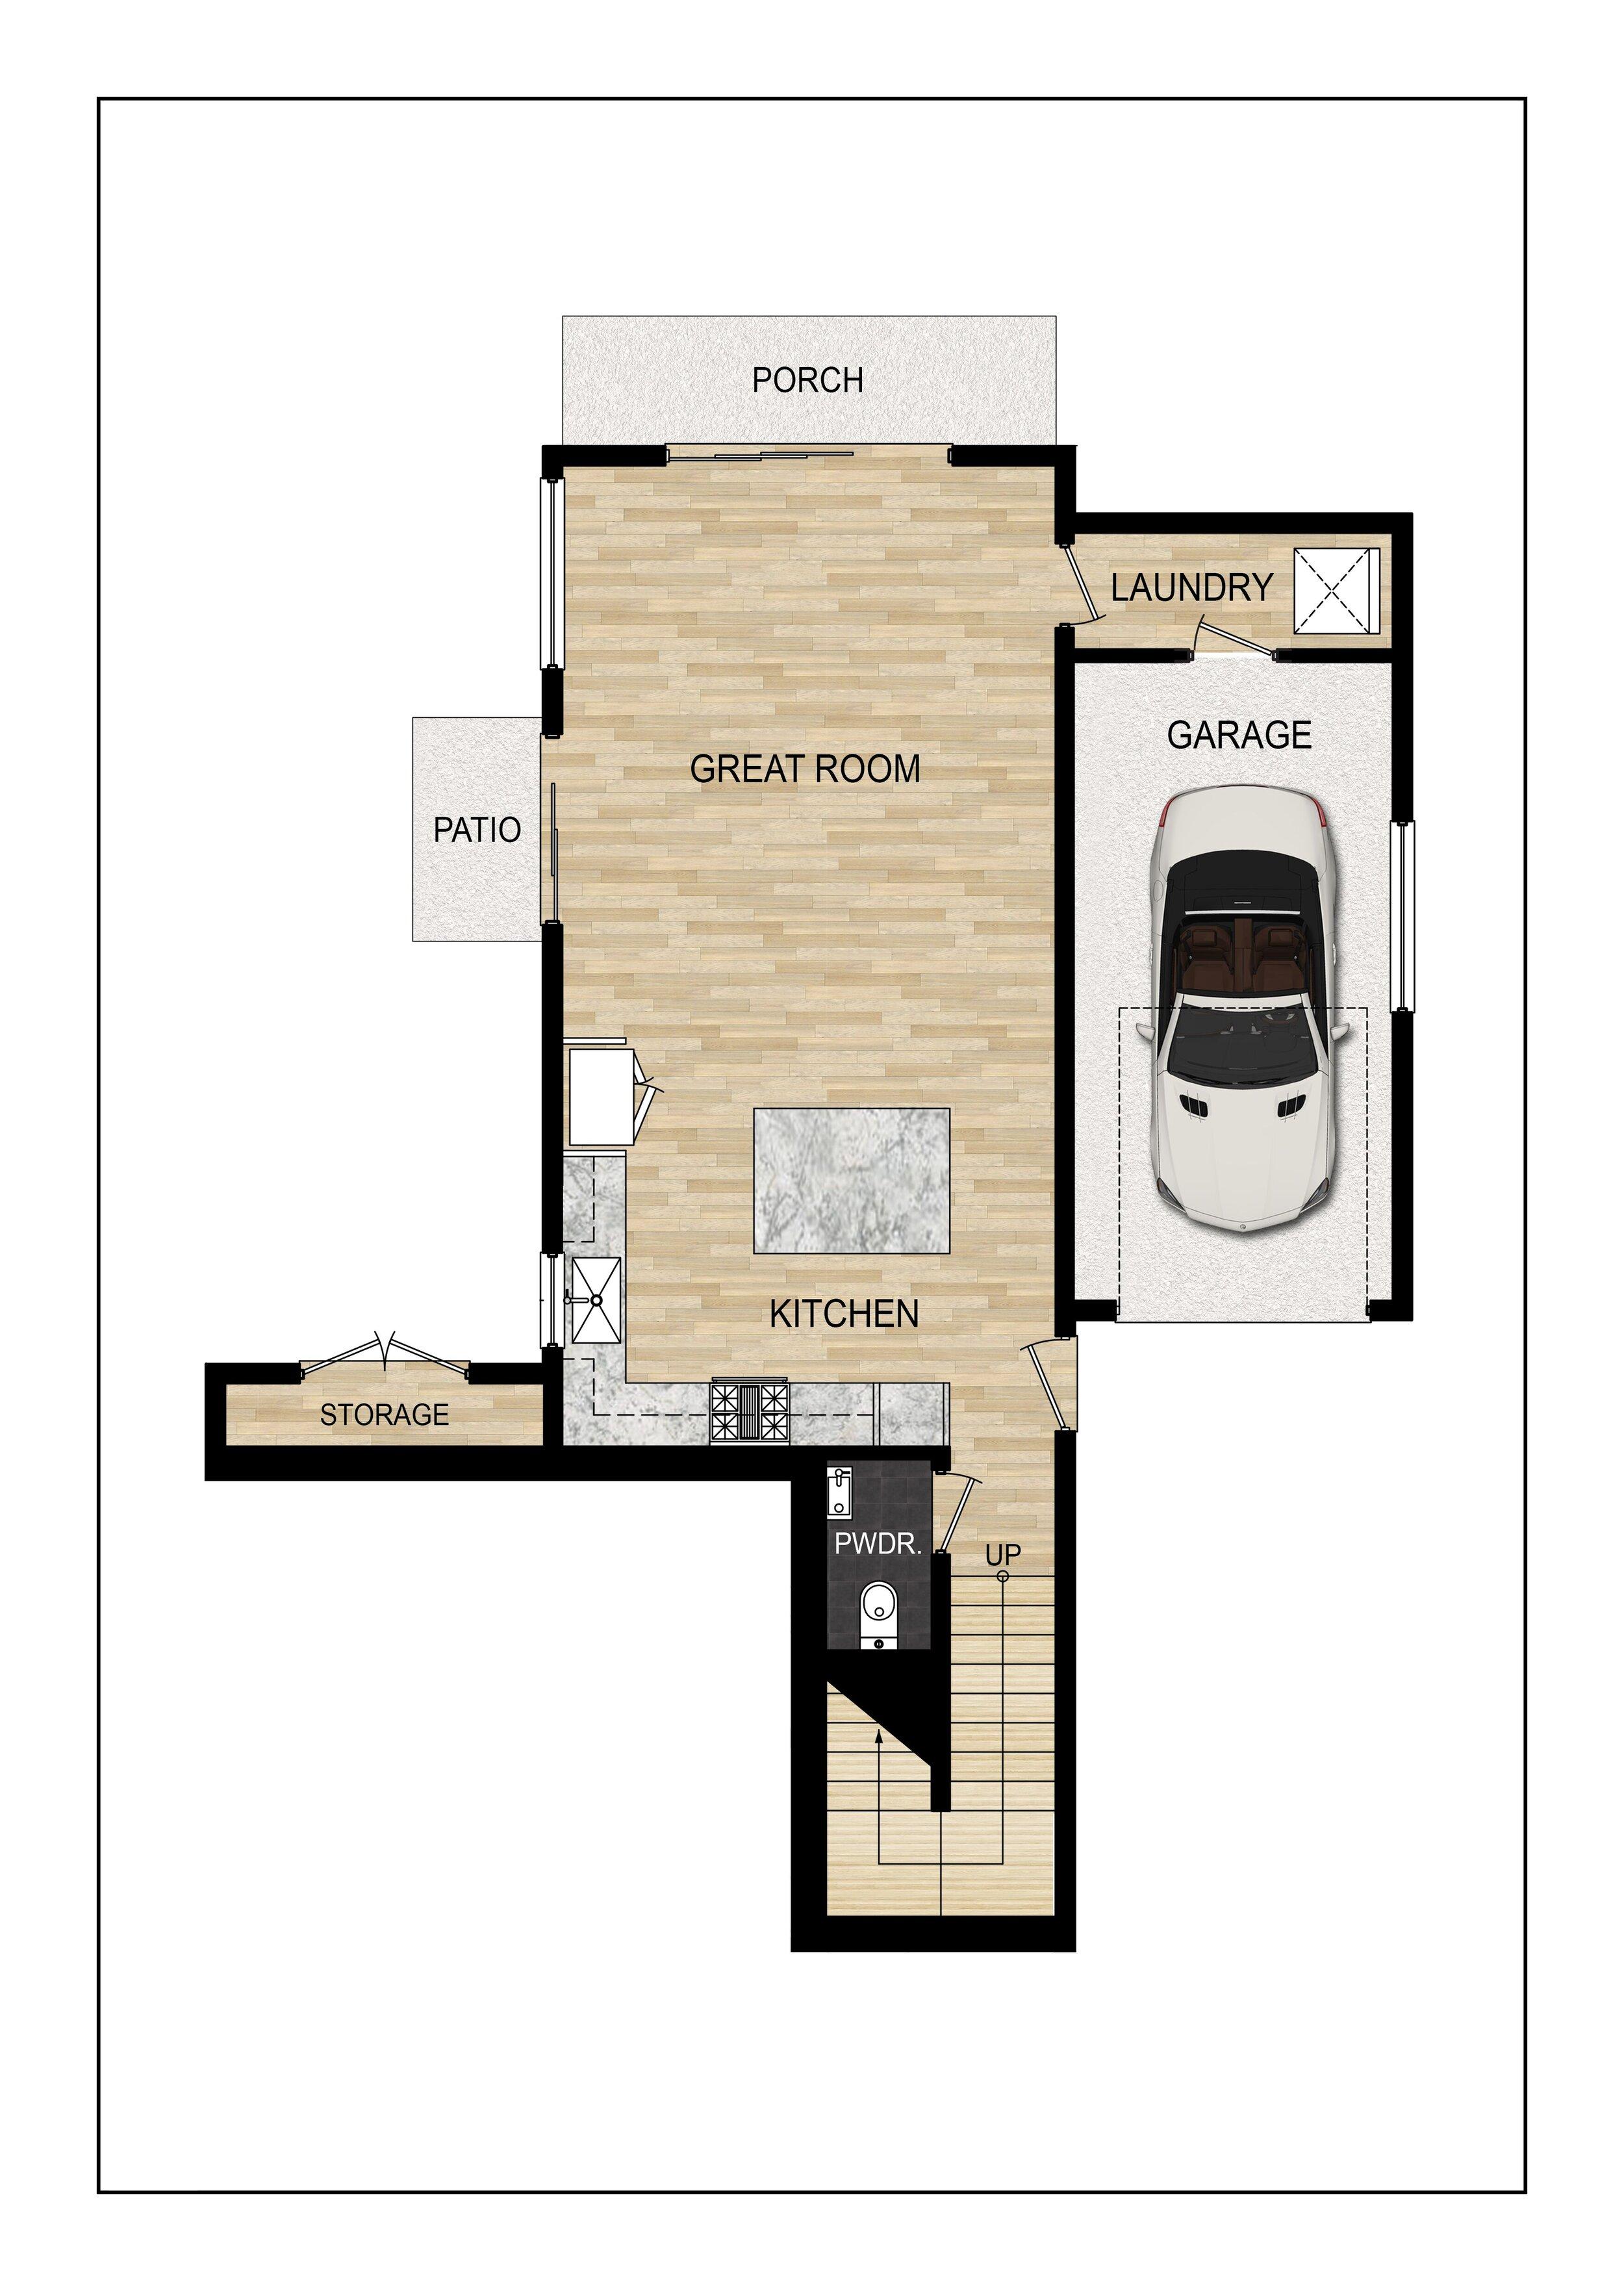 4614-b-gillis-78745-floorplan